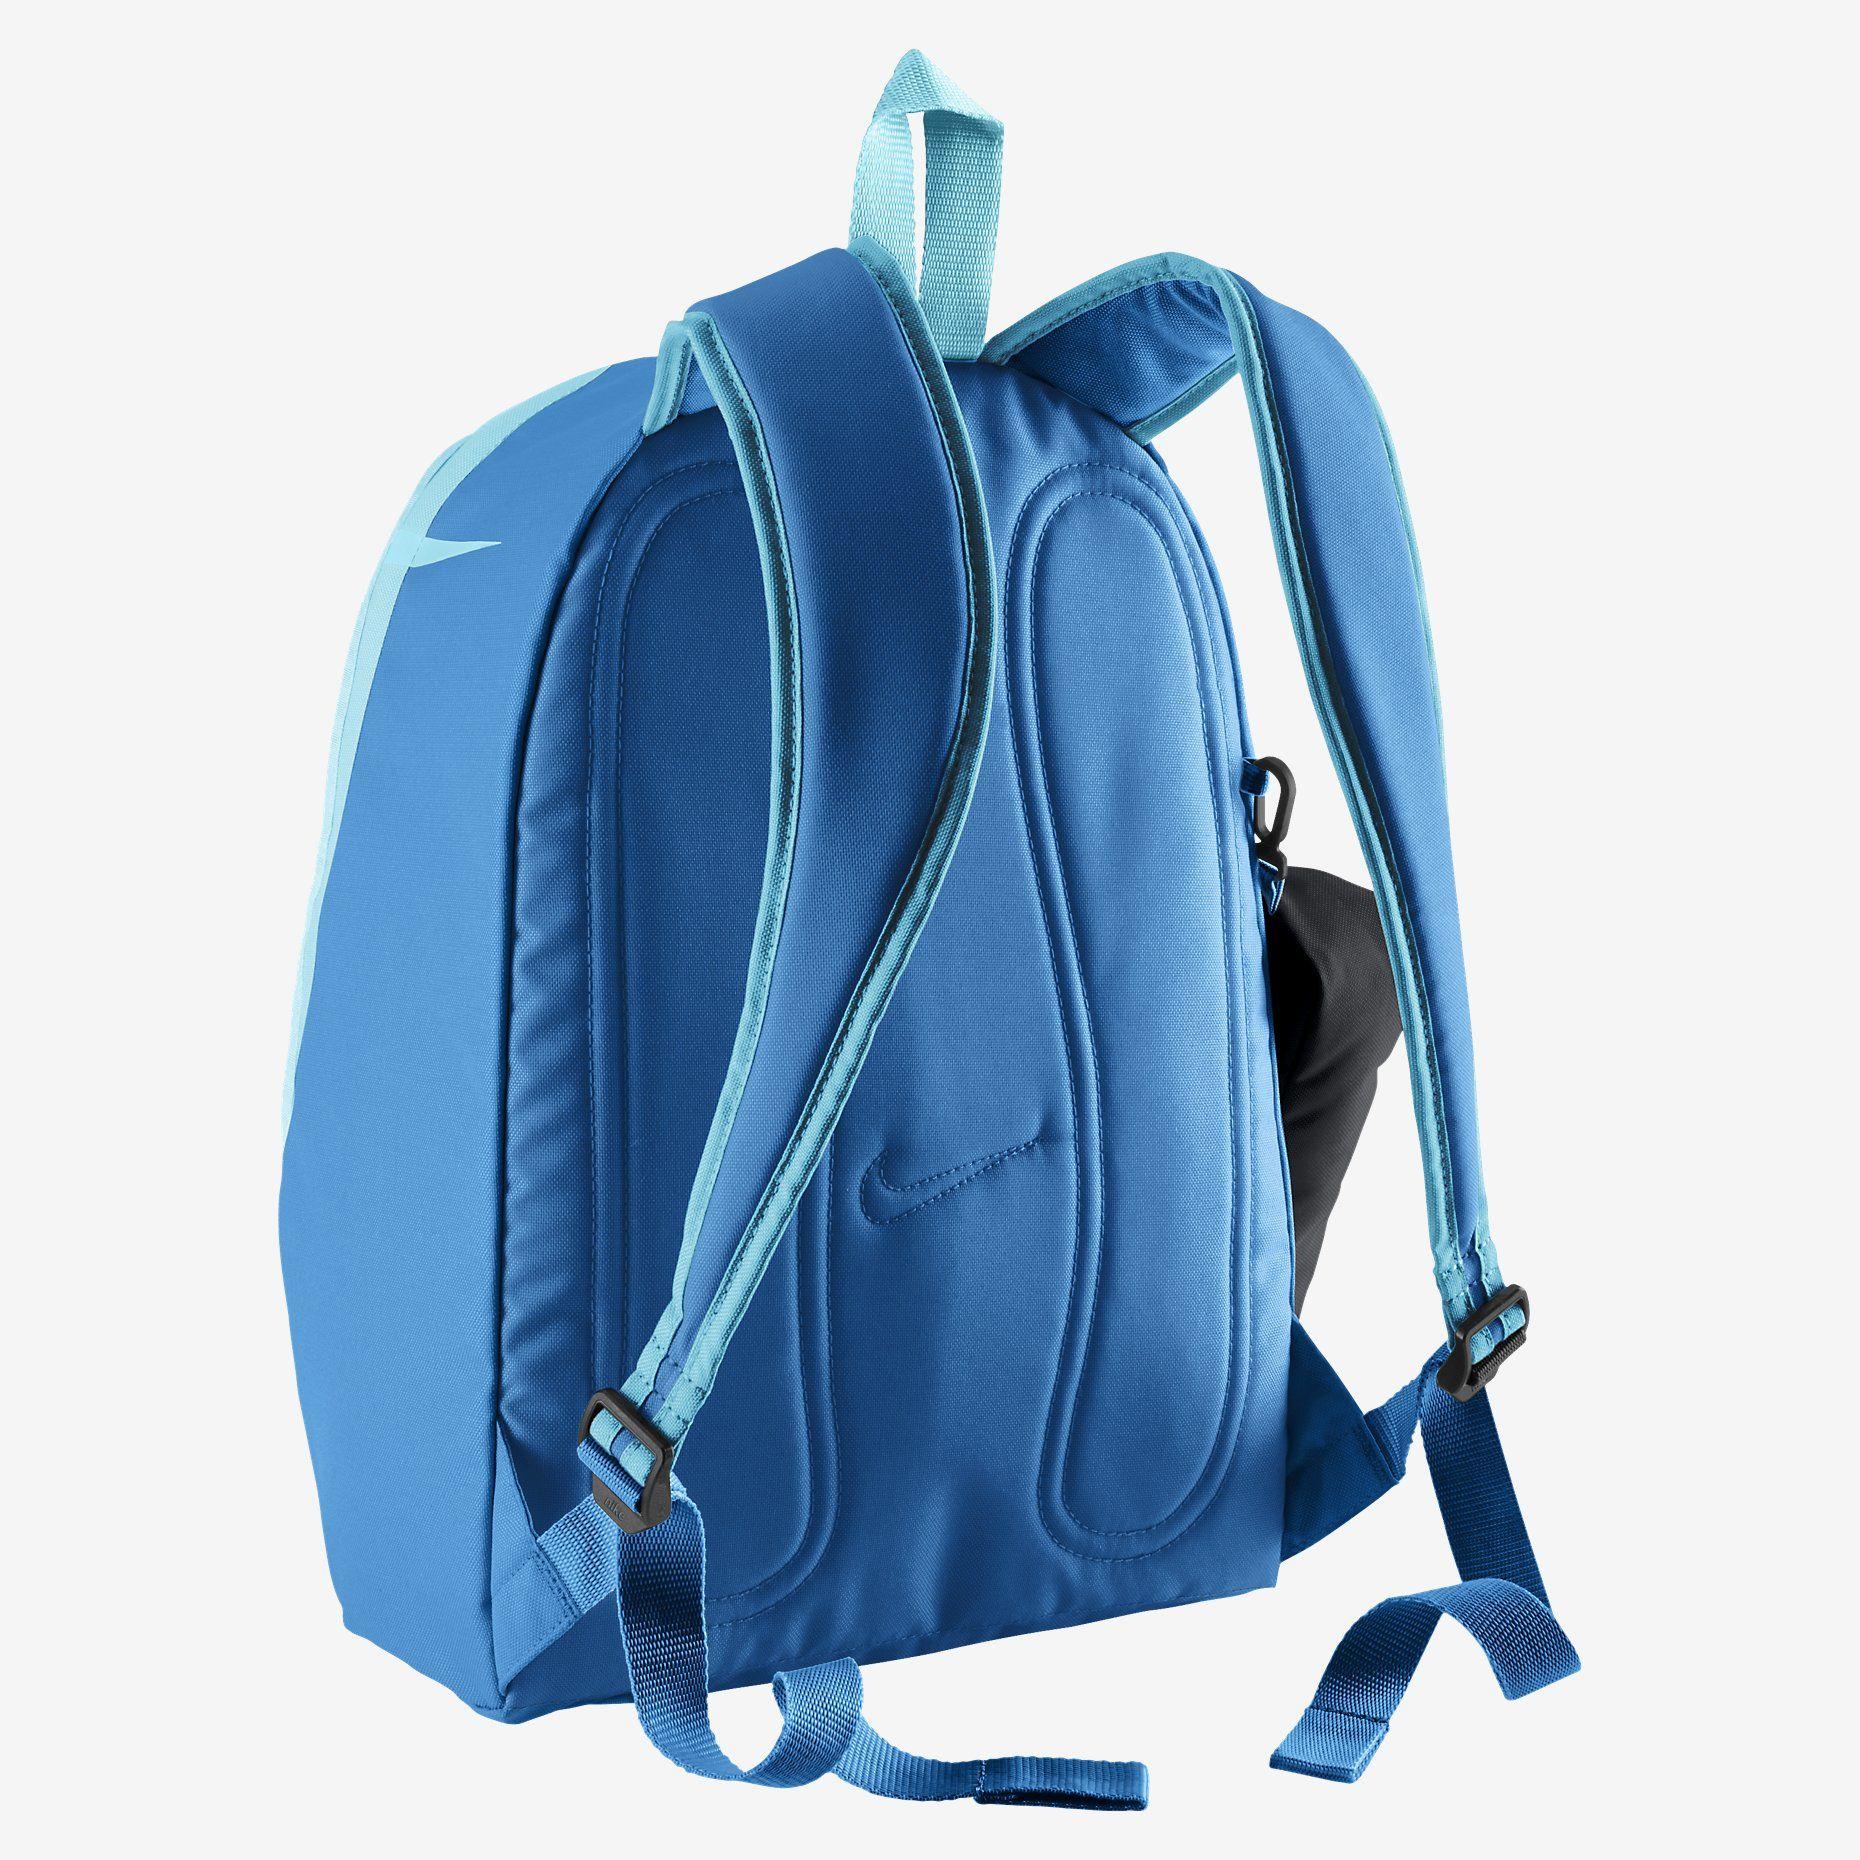 cba9b9adbc28 Nike Halfday Back To School Kids  Backpack. Nike Store